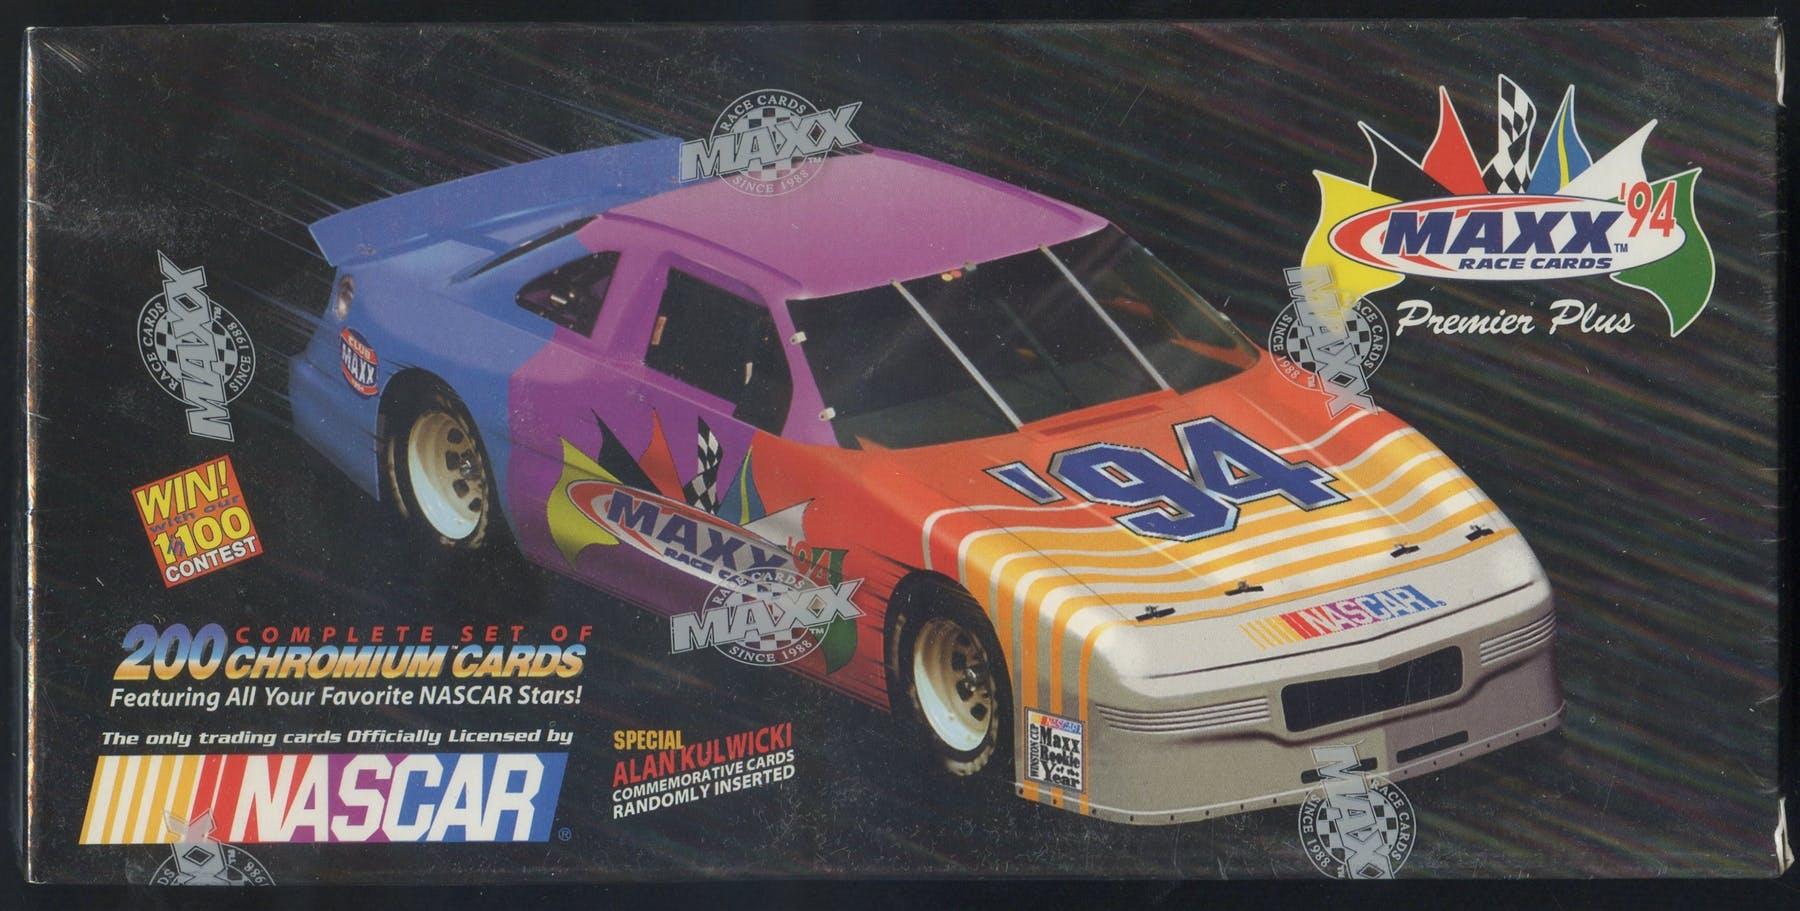 1994 J.R. Maxx Inc. Maxx Premier Plus Racing Factory Set | DA Card World